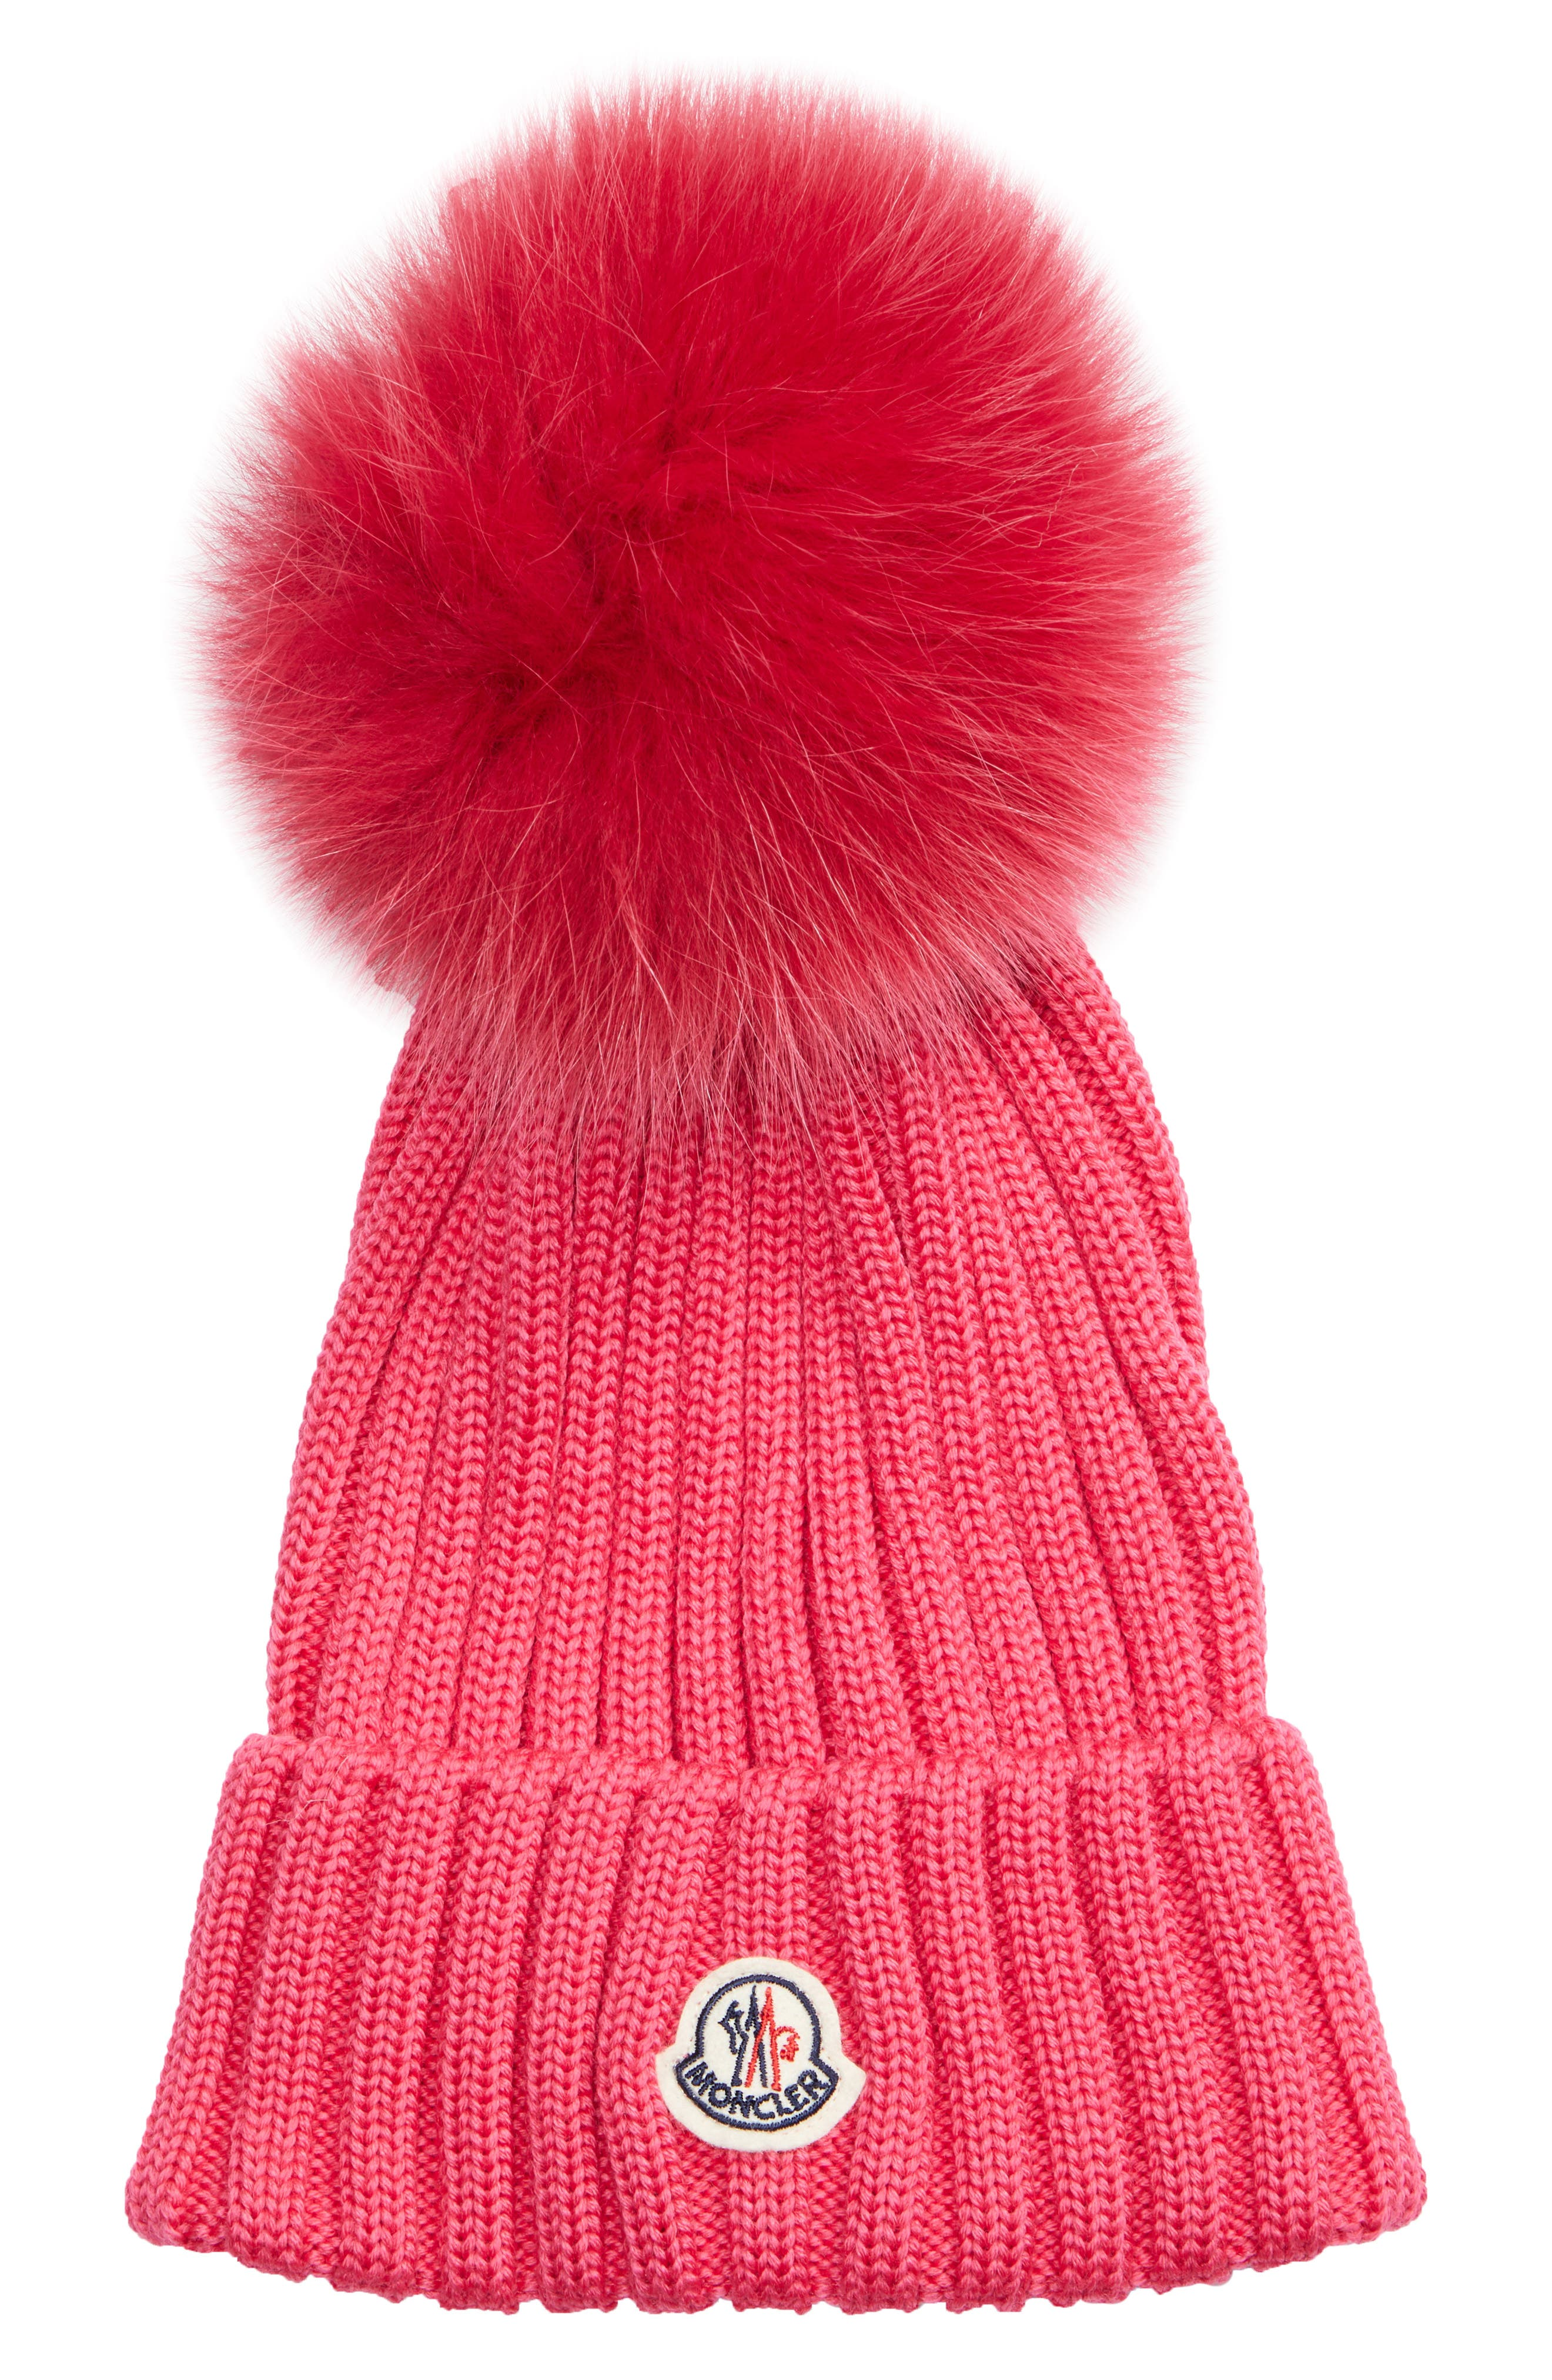 Moncler Genuine Fox Fur Pom Wool Beanie - Purple